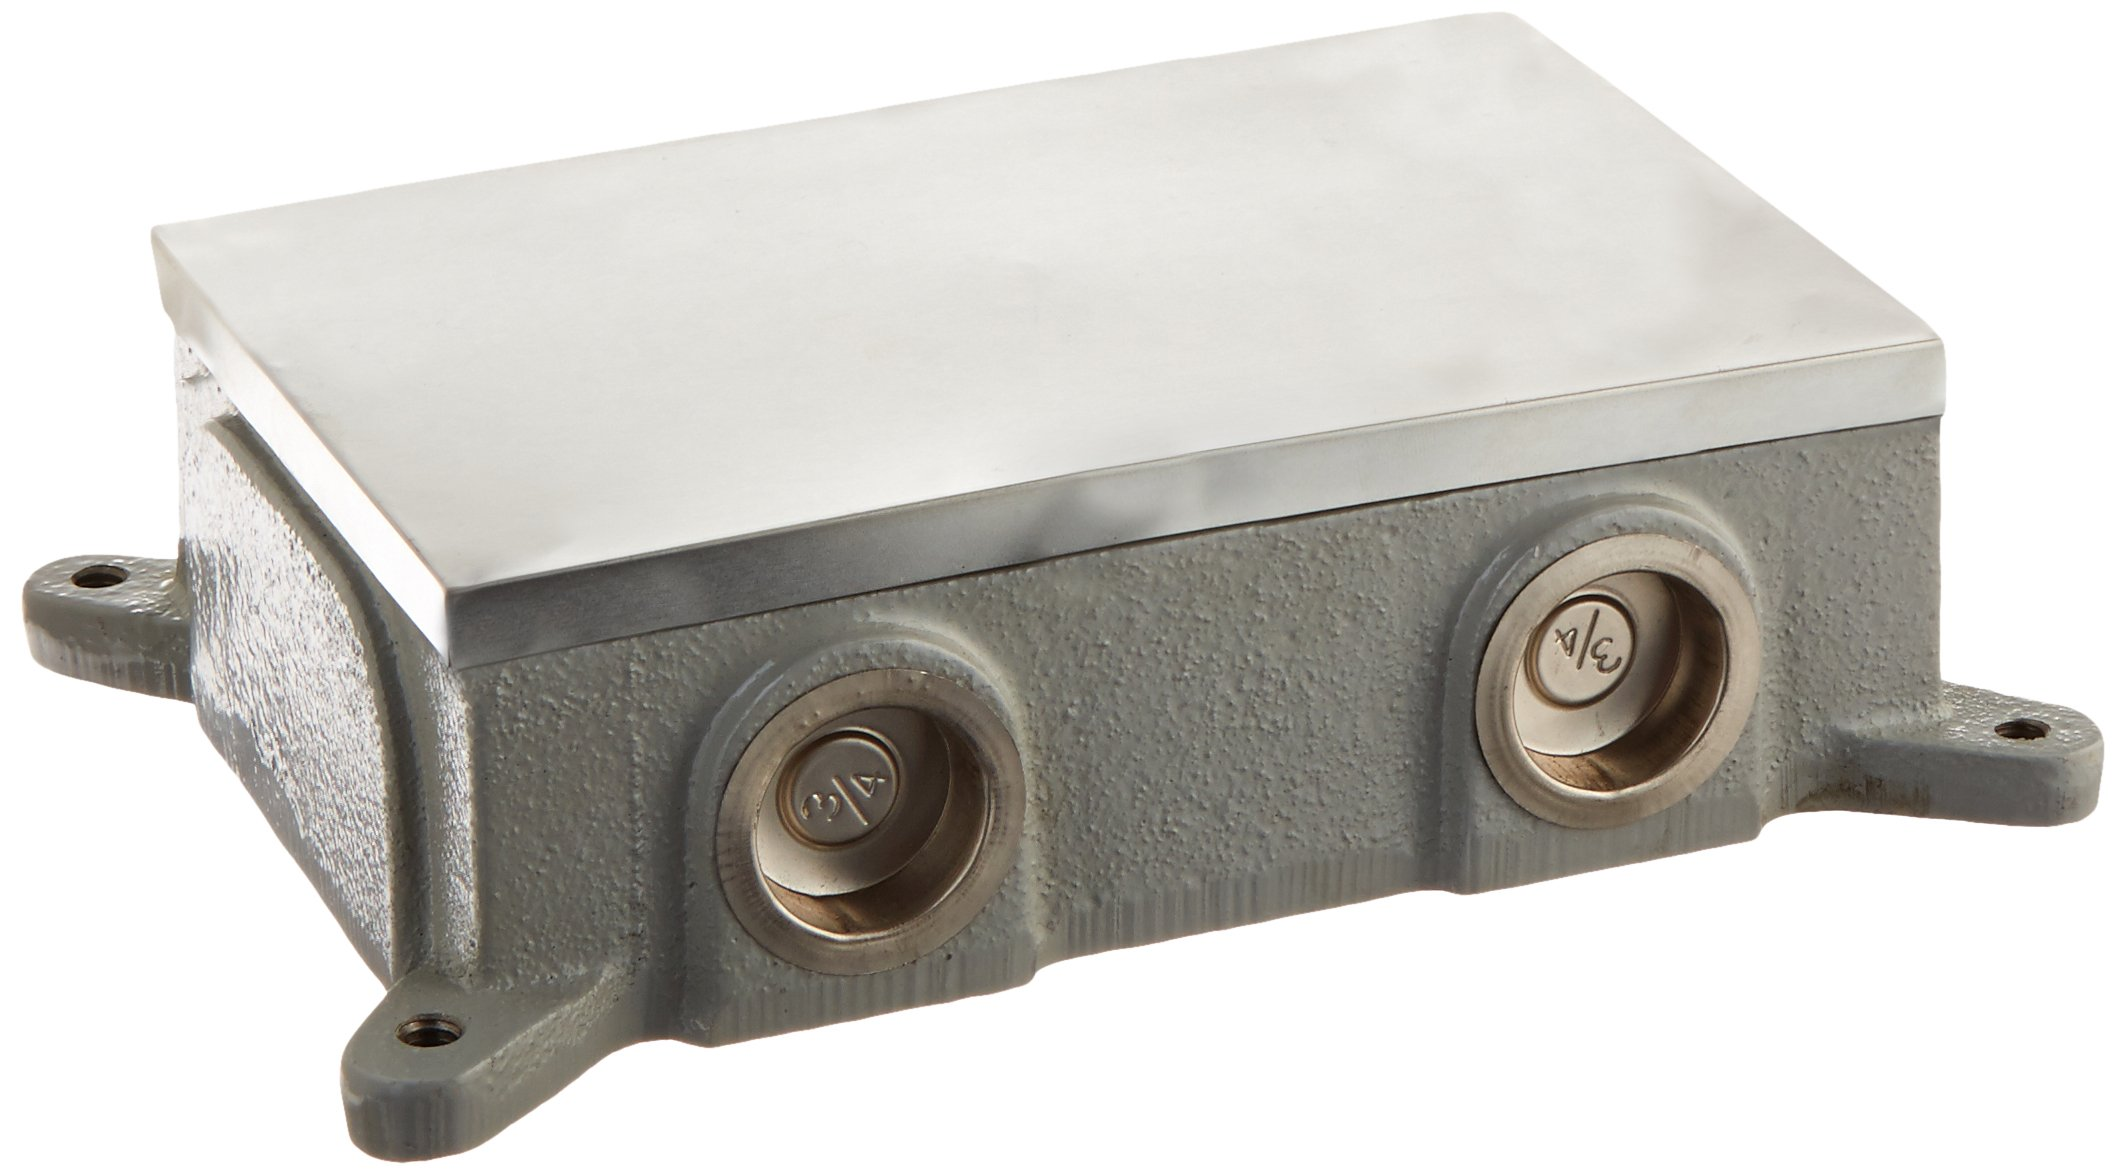 Hubbell BA4214 2 Gang Rectangular Cast Floor Box, Shallow, Semi Adjustable, Aluminum